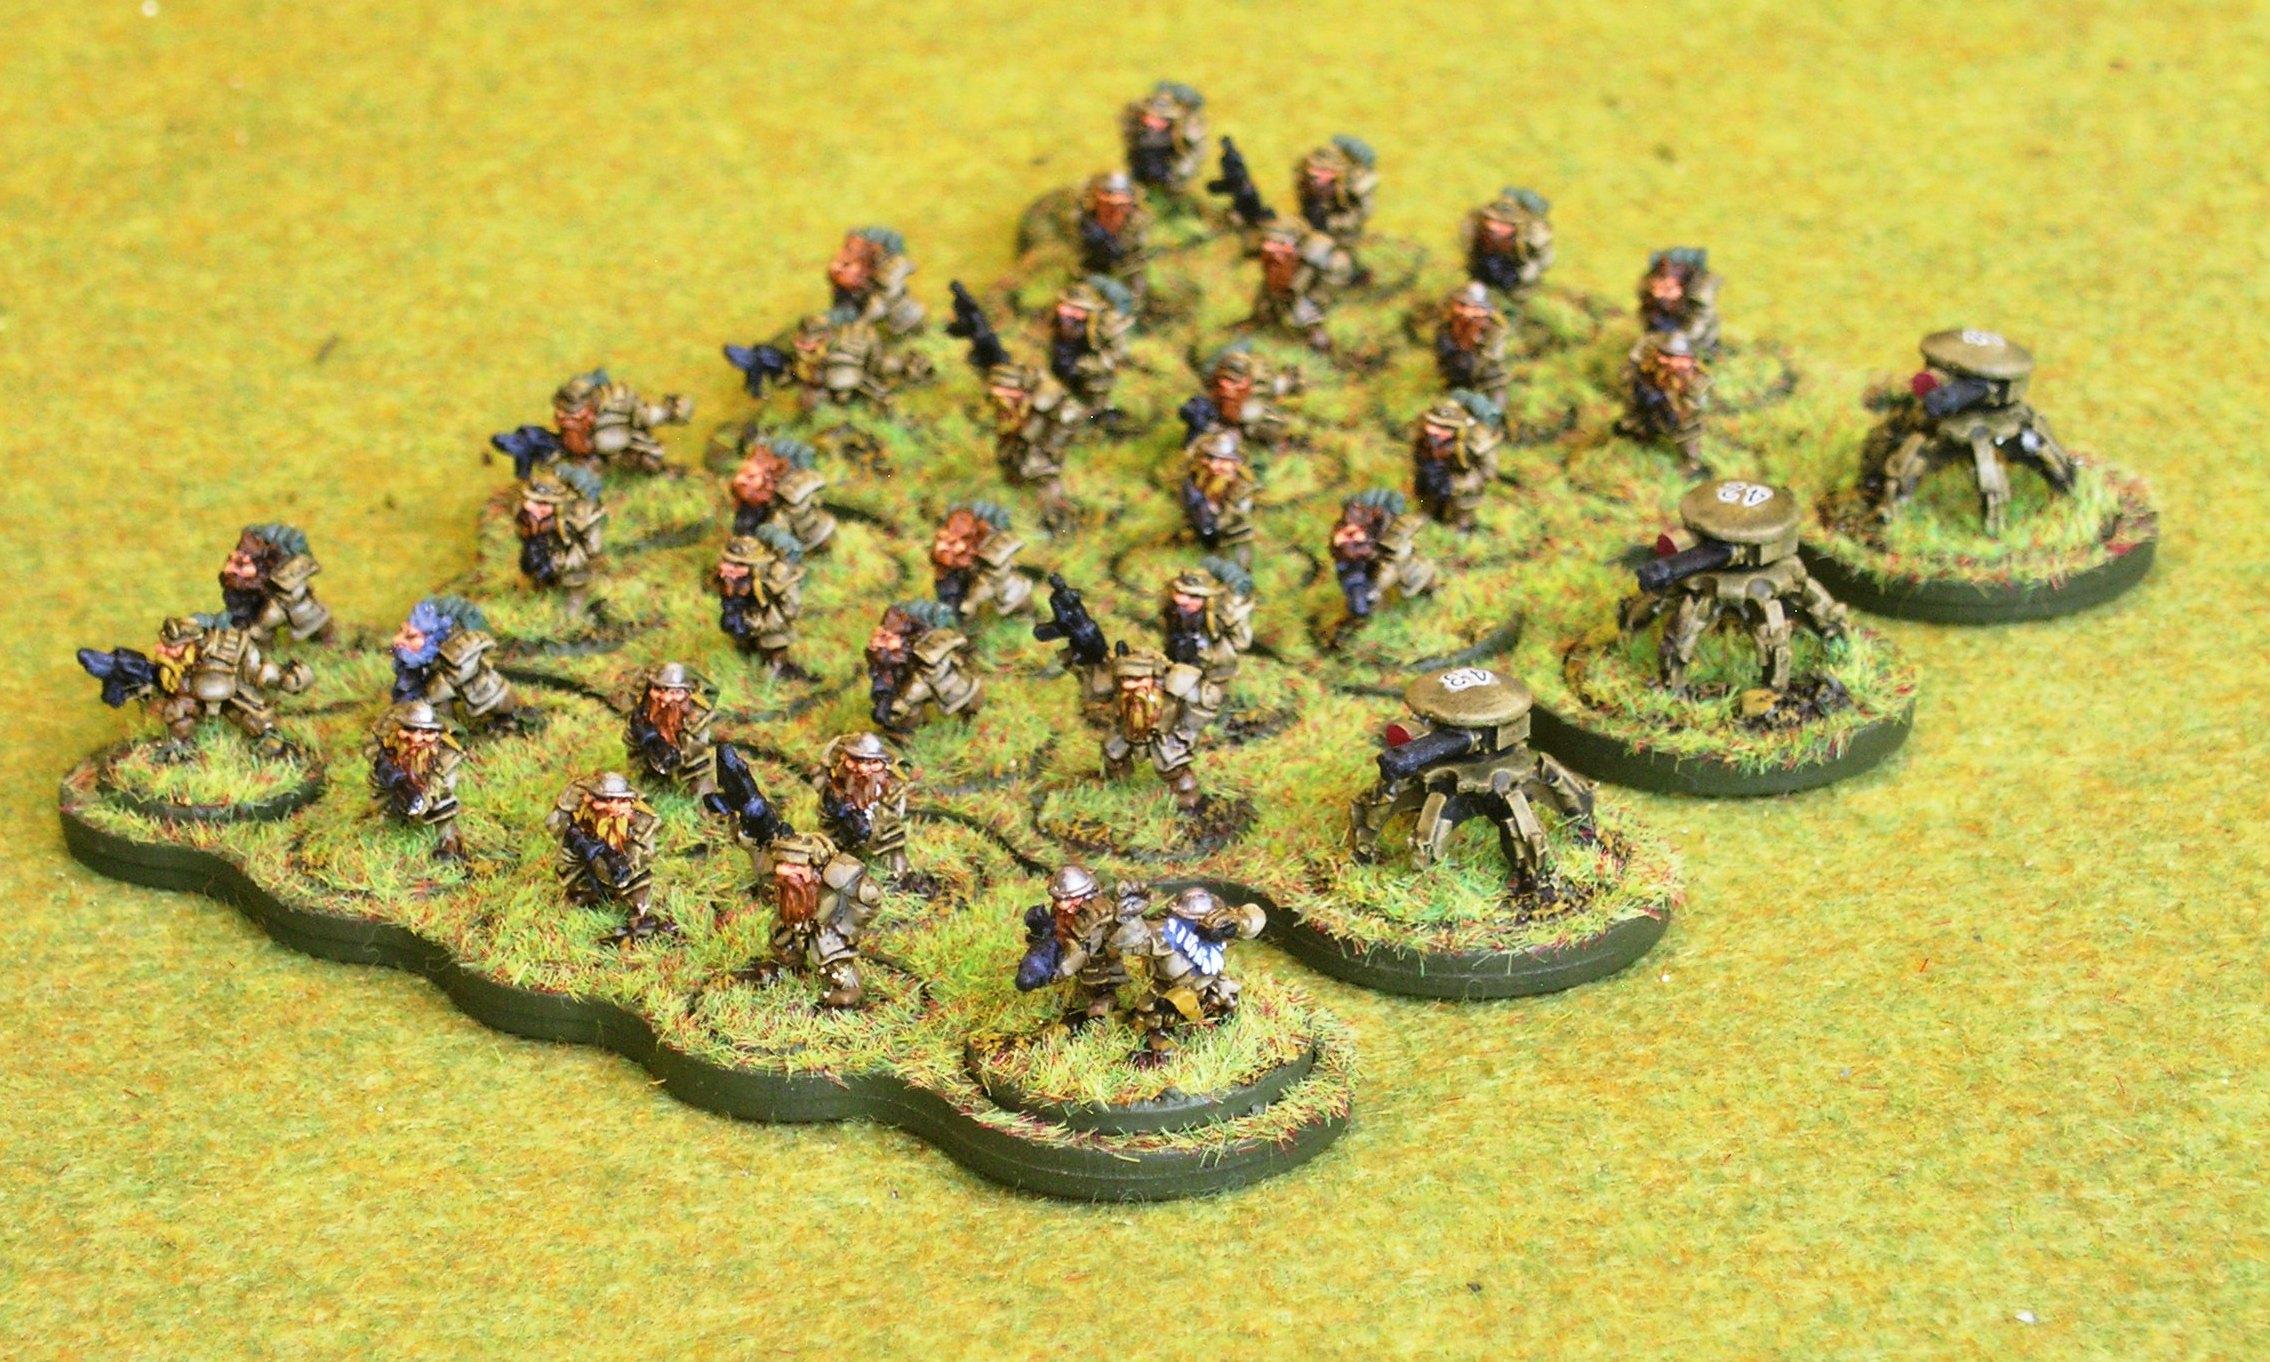 2nd (Lethling) Infantry Platoon